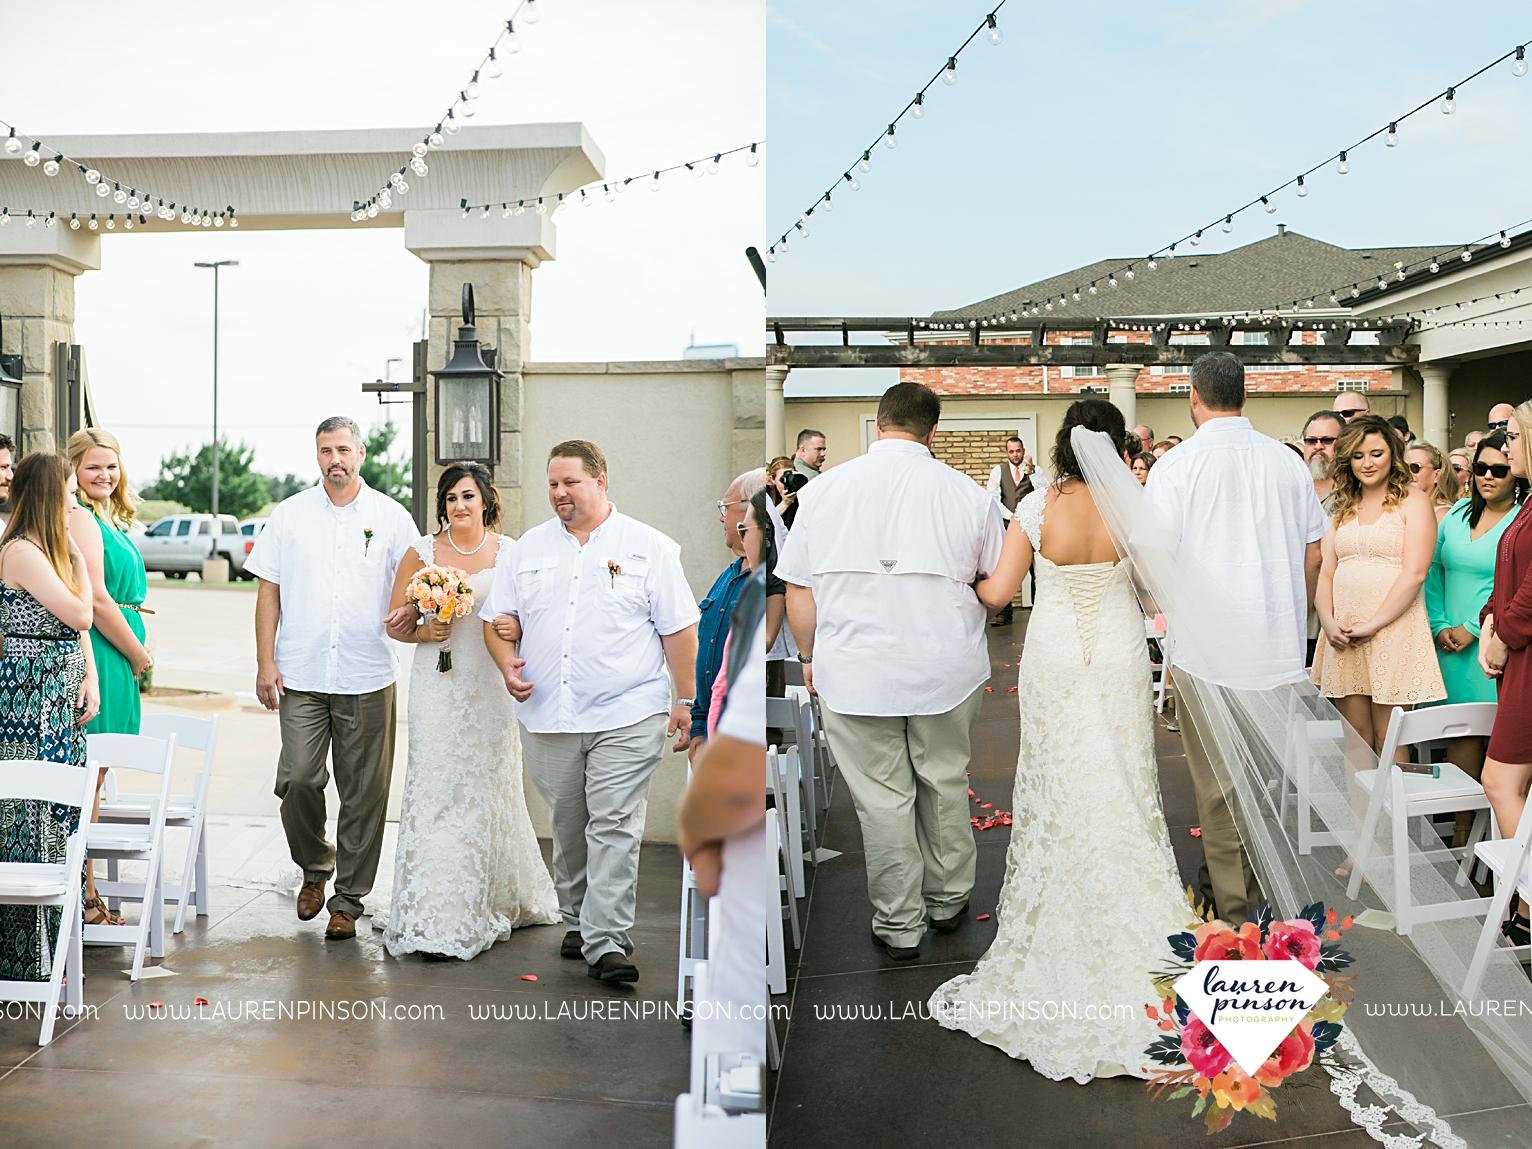 wichita-falls-texas-wedding-photographer-wellington-on-the-lake-with-mayfield-events_2969.jpg